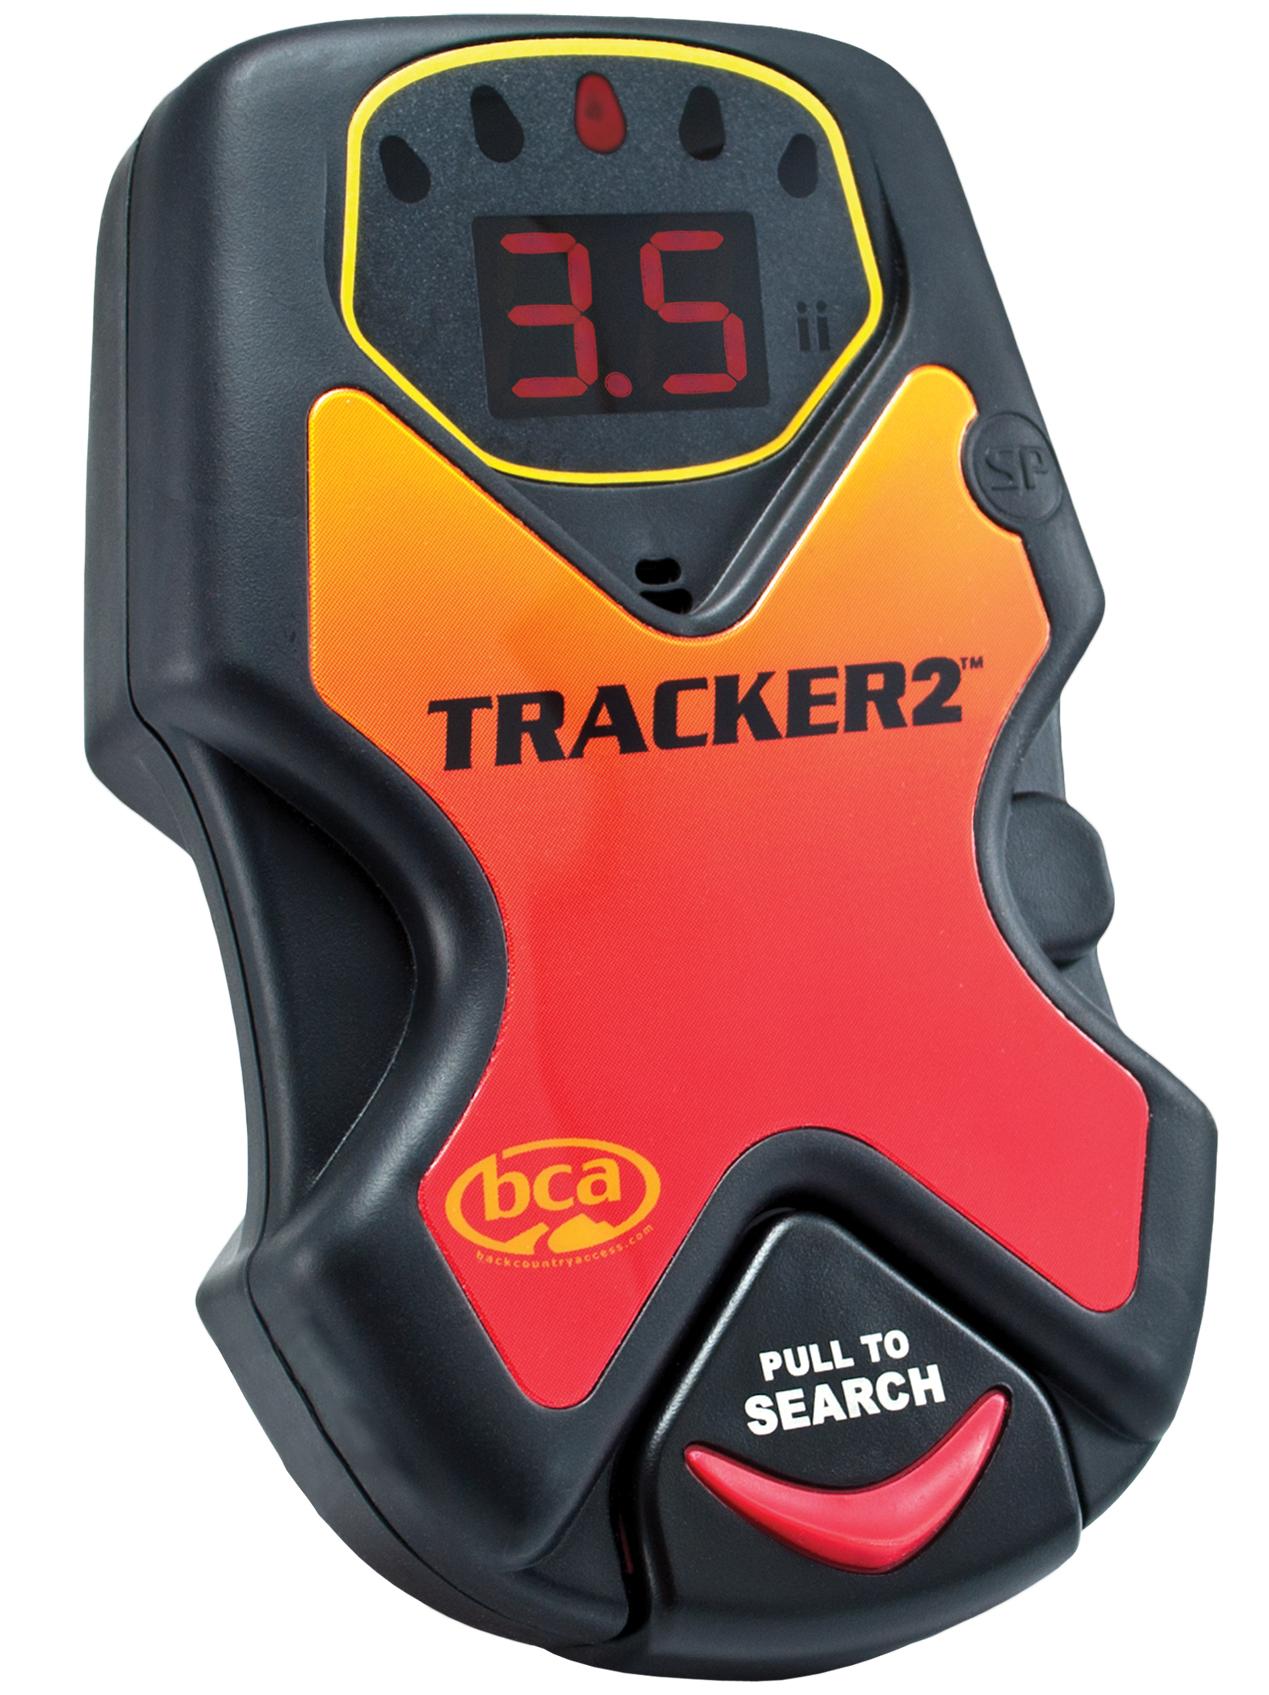 tracker_t2-high-res.jpg